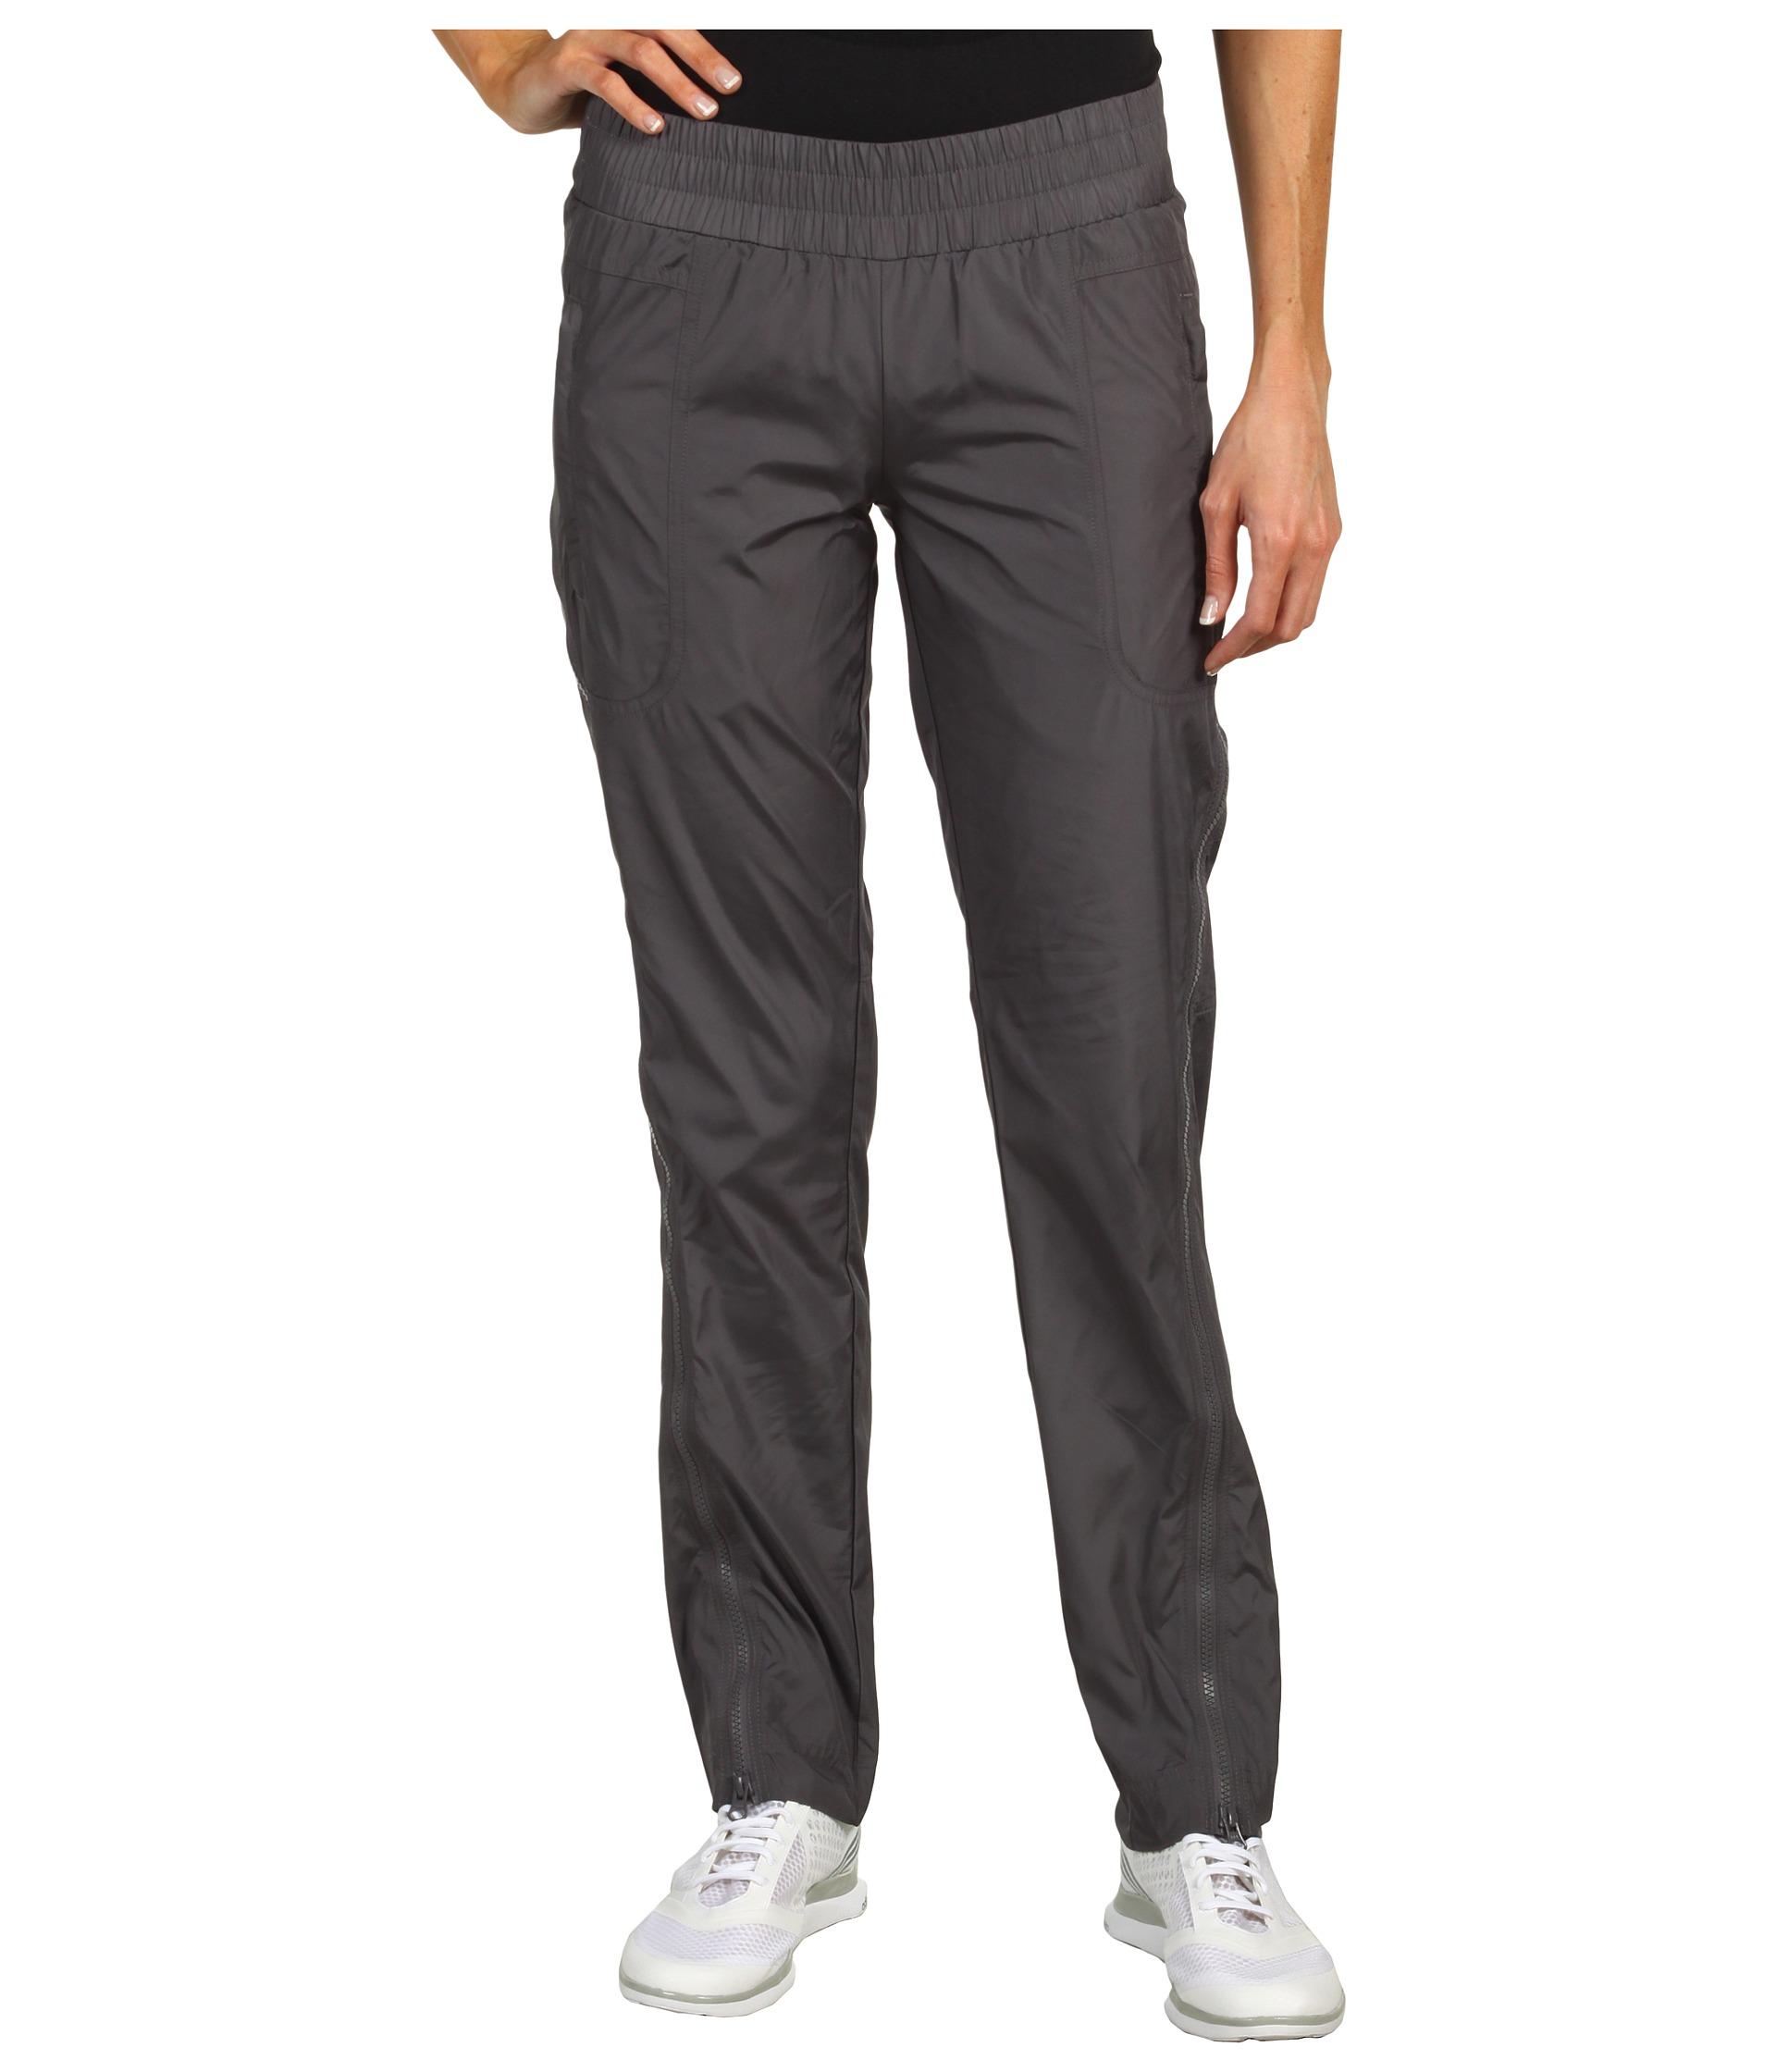 Adidas Stella McCartney Studio Woven Pants Front View